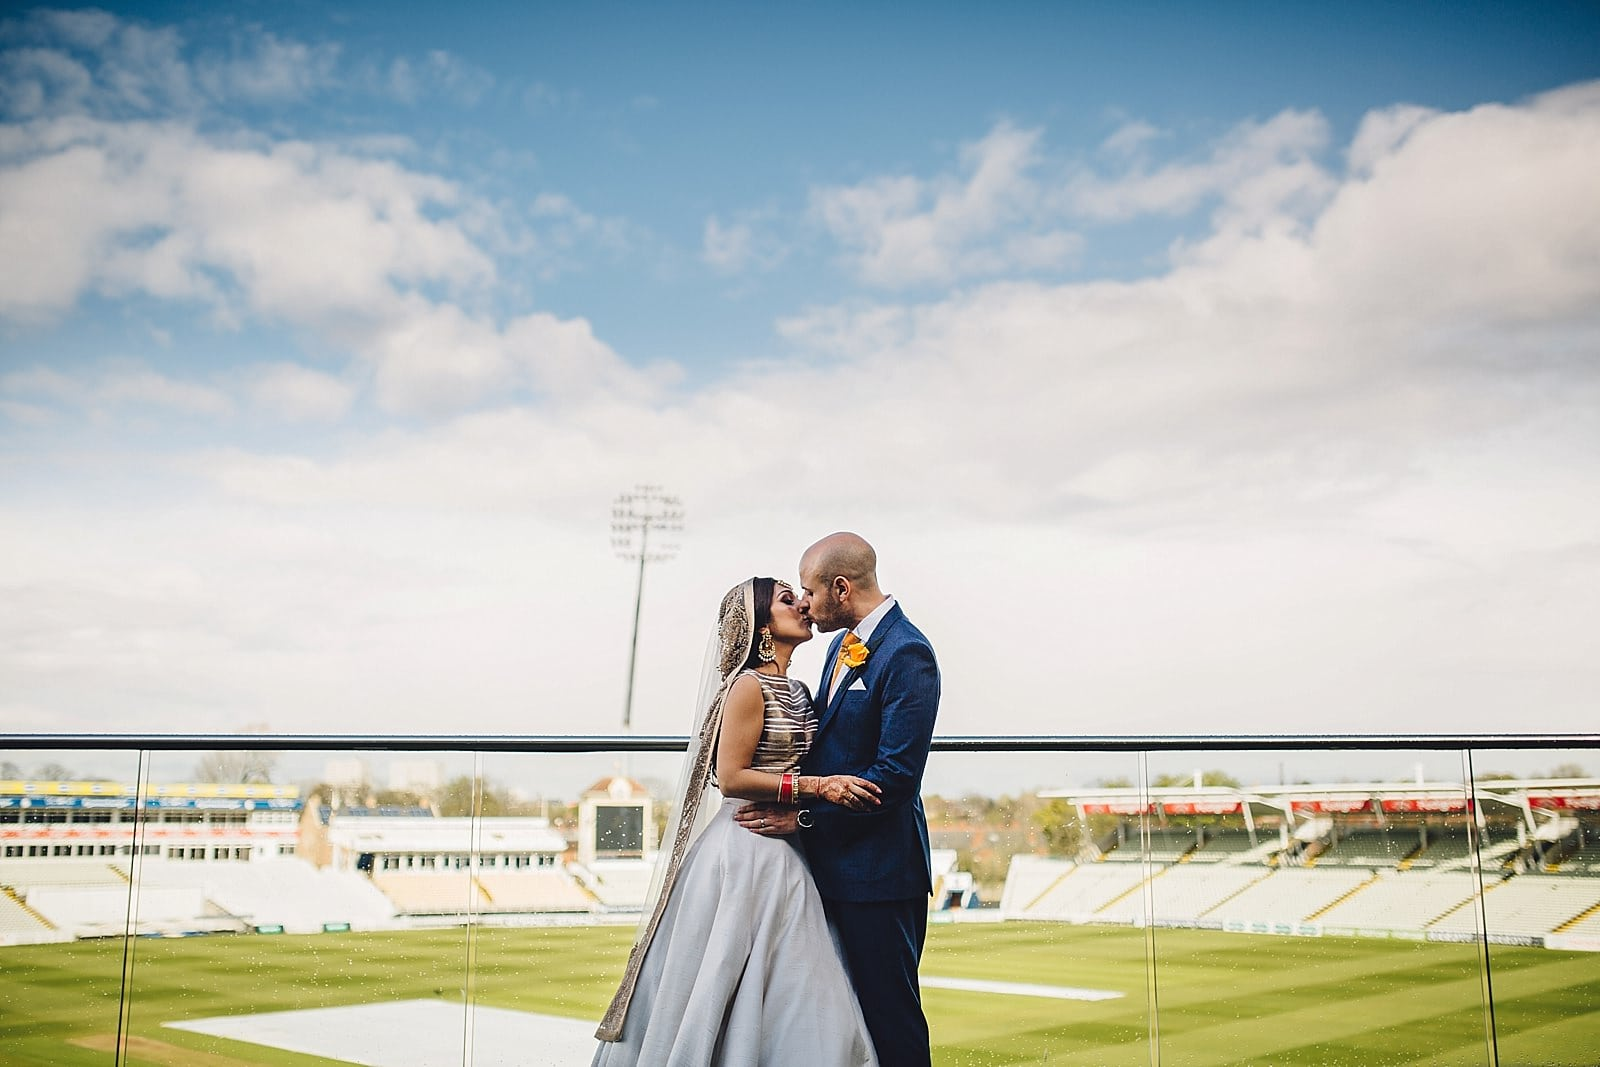 sikh-wedding-photography-birmingham-edgbaston_0147